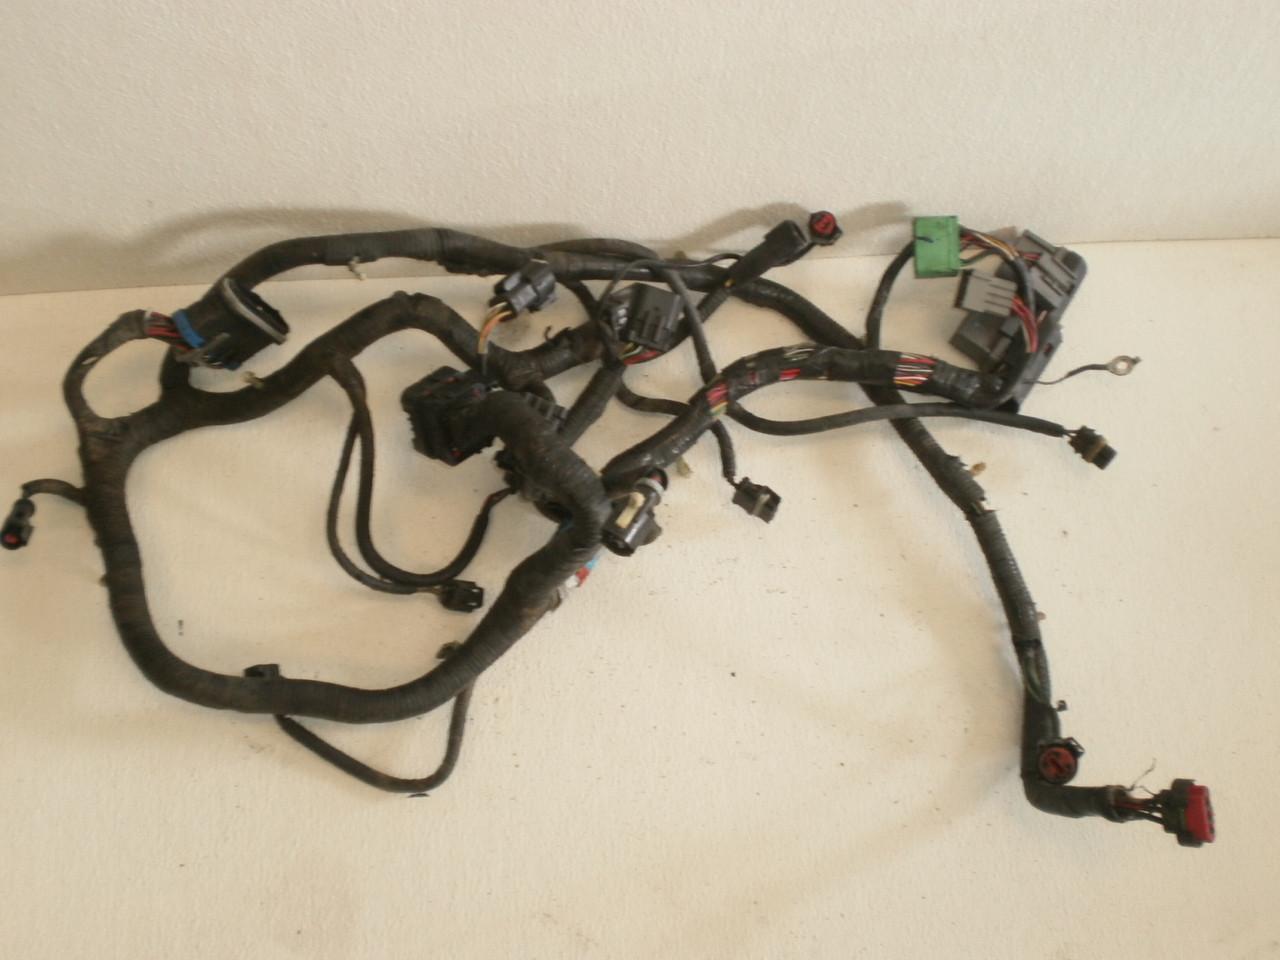 medium resolution of 2001 mustang alternator wiring harness wiring diagram schematics 2001 mustang radio wiring harness 01 mustang wiring